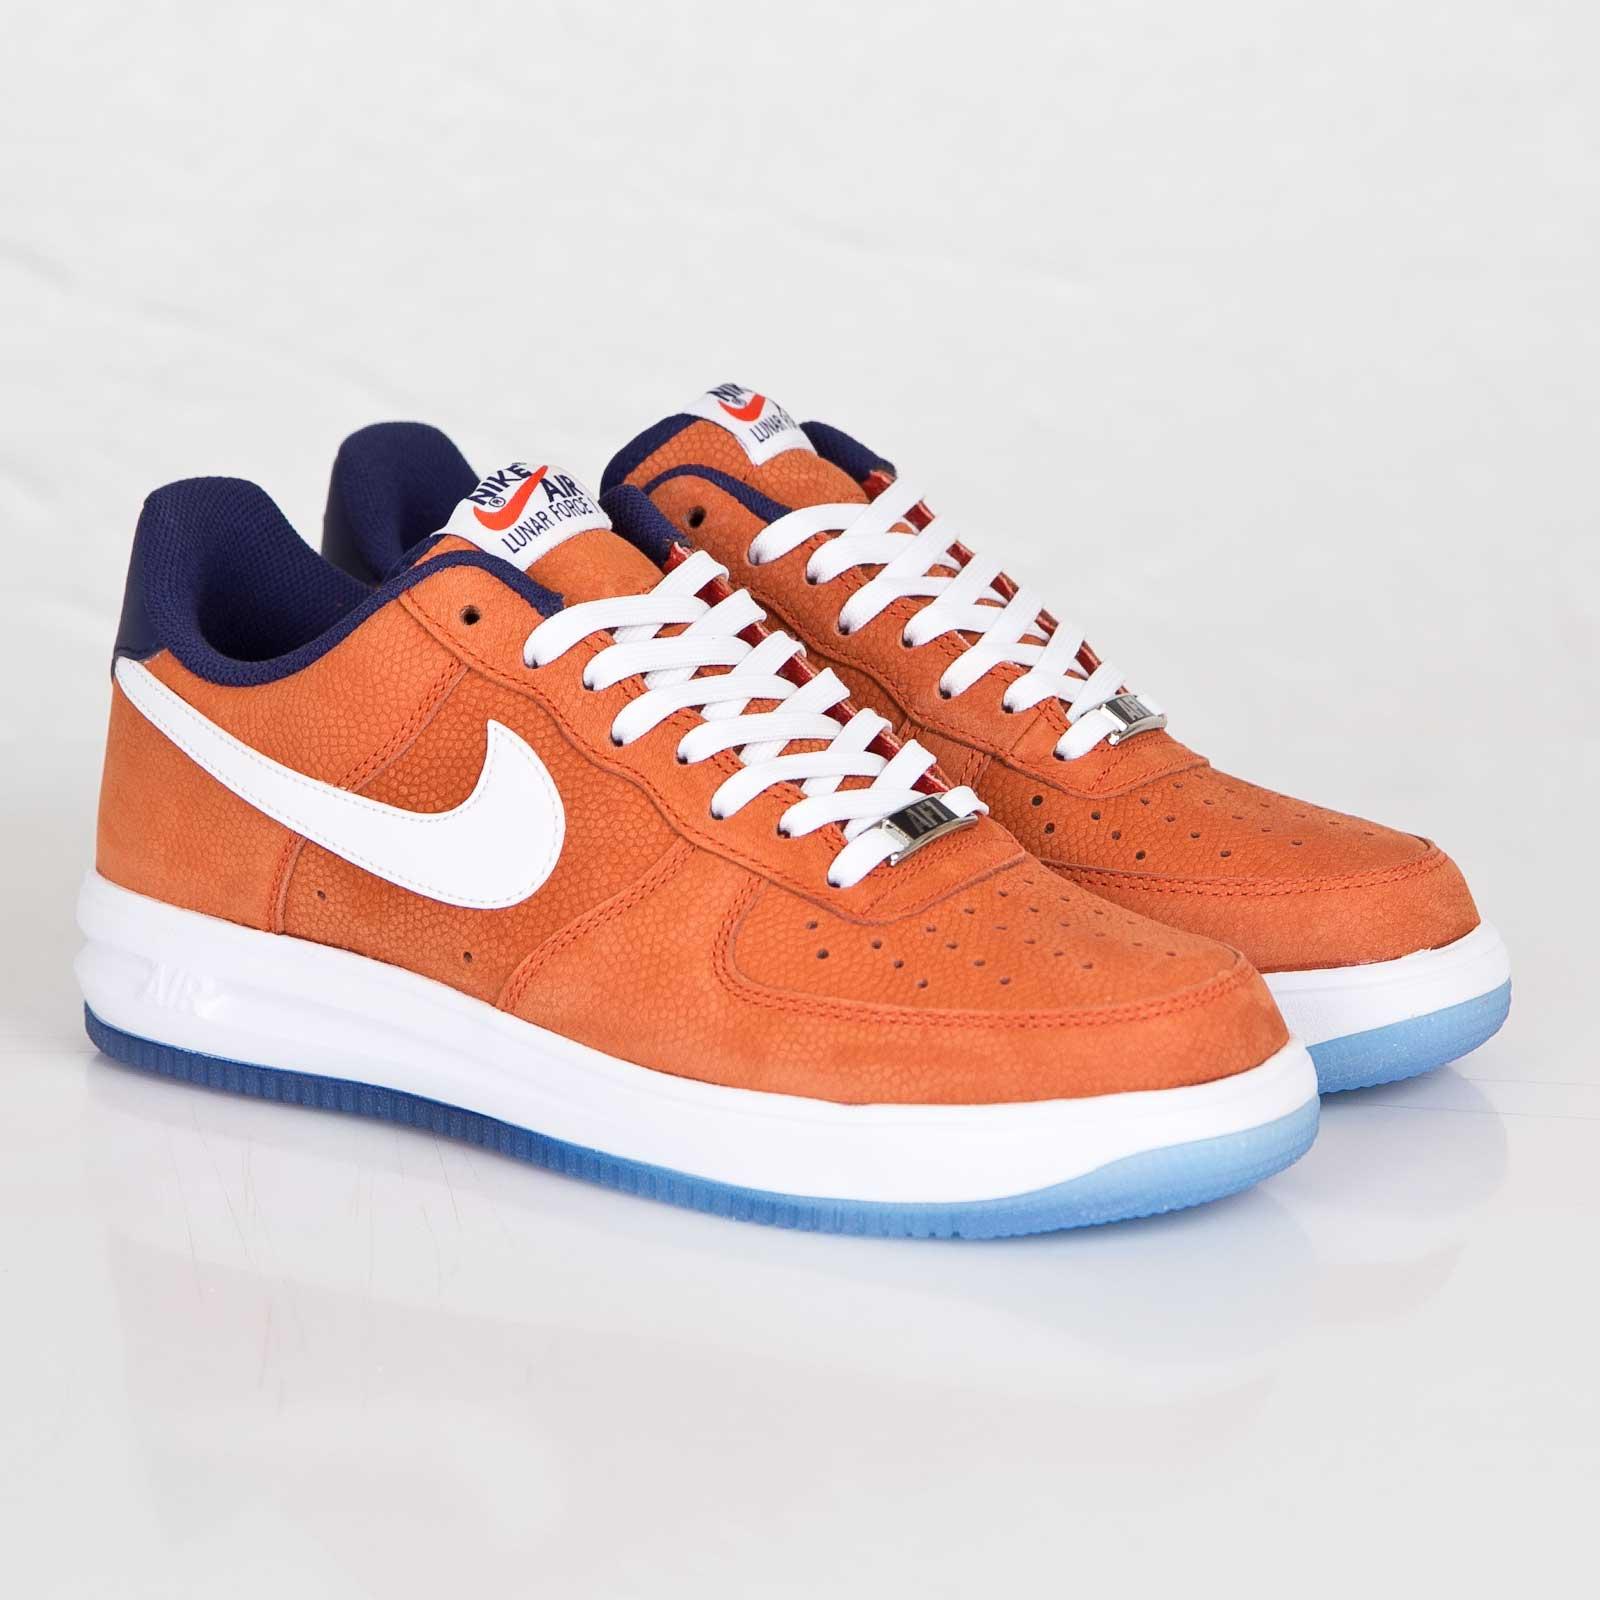 Nike Lunar Force 1 Qs (City Pack) - Sneaker Freaker